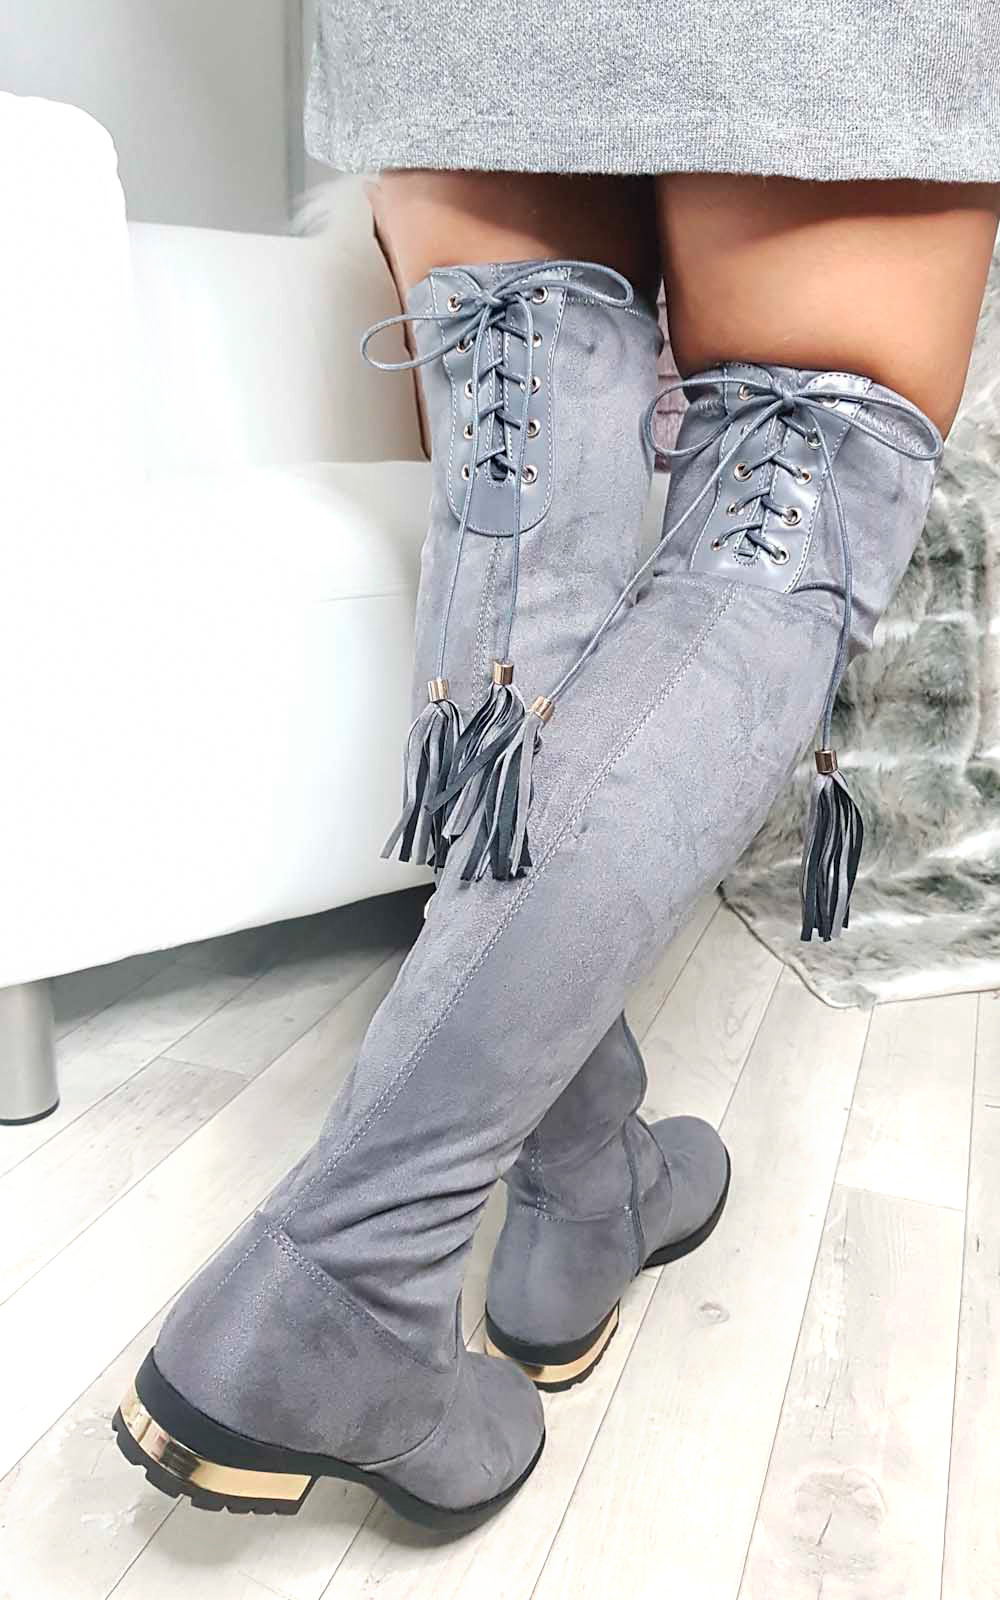 Katie Faux Suede Tassel Knee High Boots in Grey